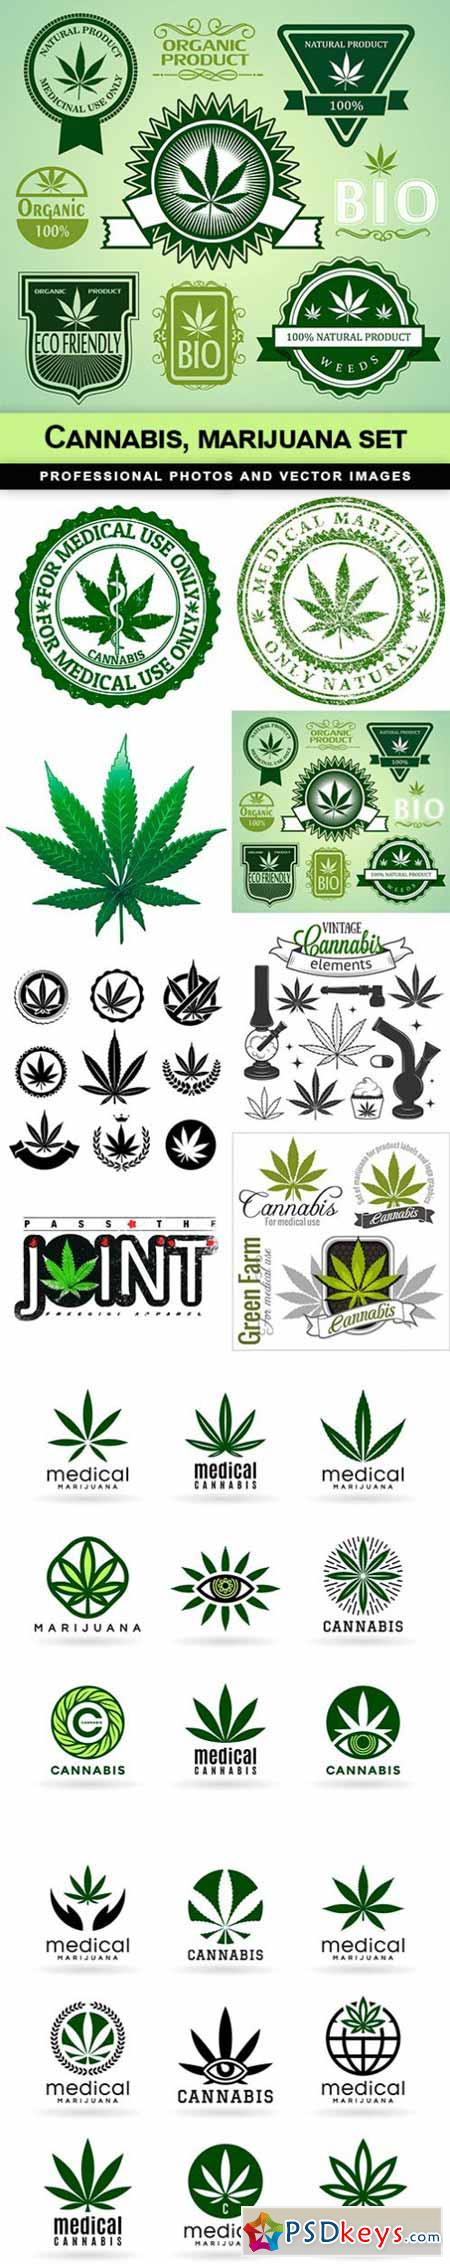 Cannabis, marijuana set - 10 EPS